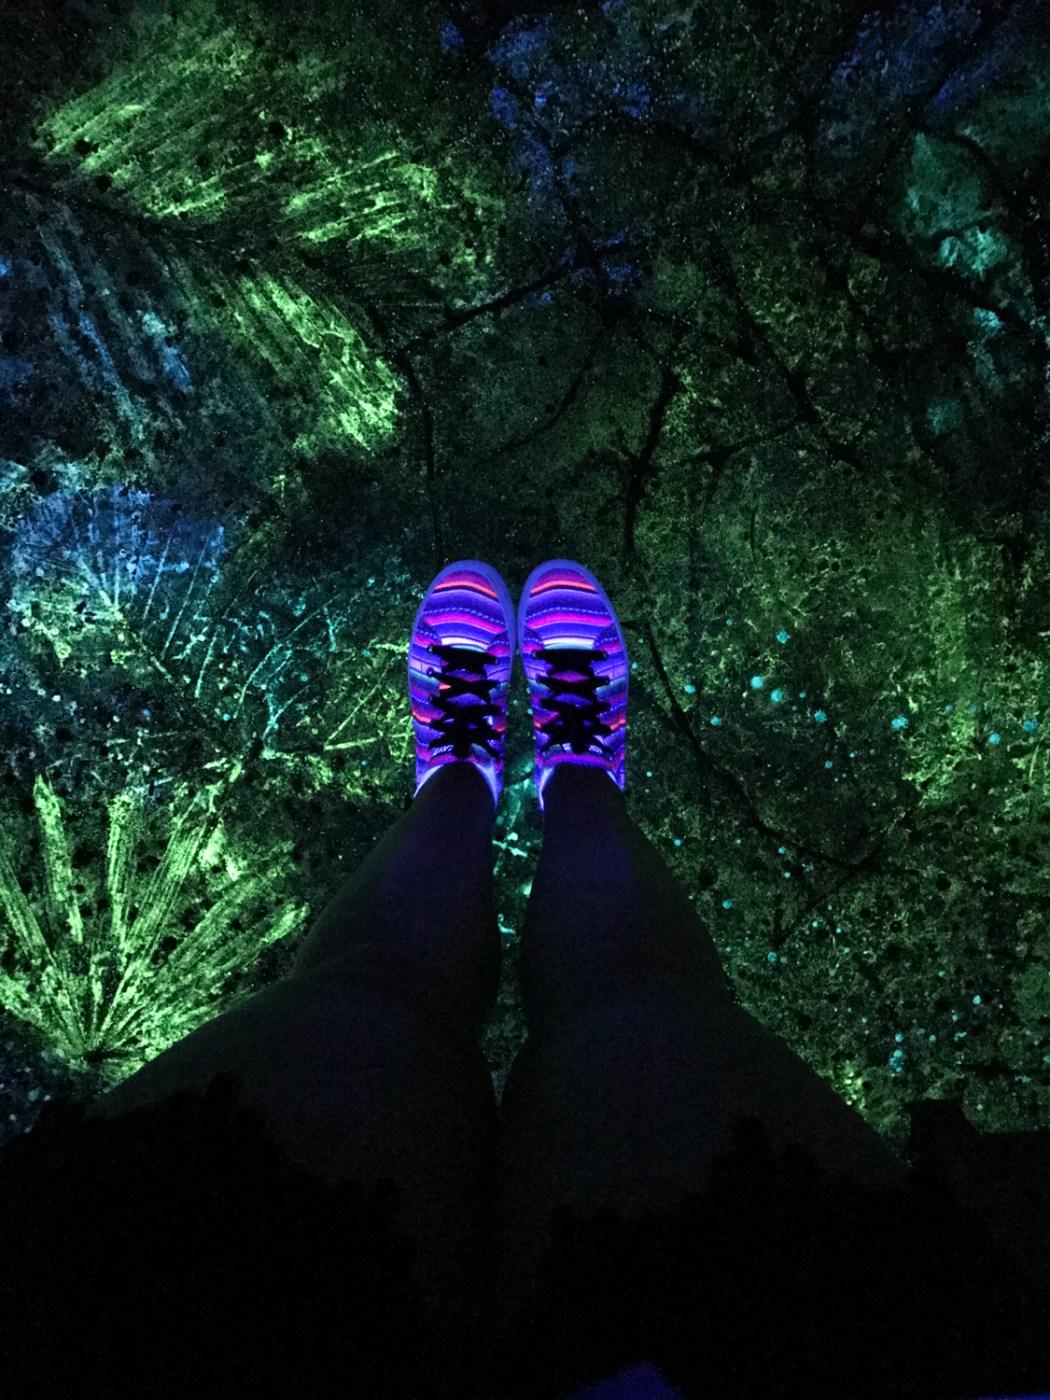 At night, glowing sidewalks light the way in Disney's Pandora - The World of Avatar